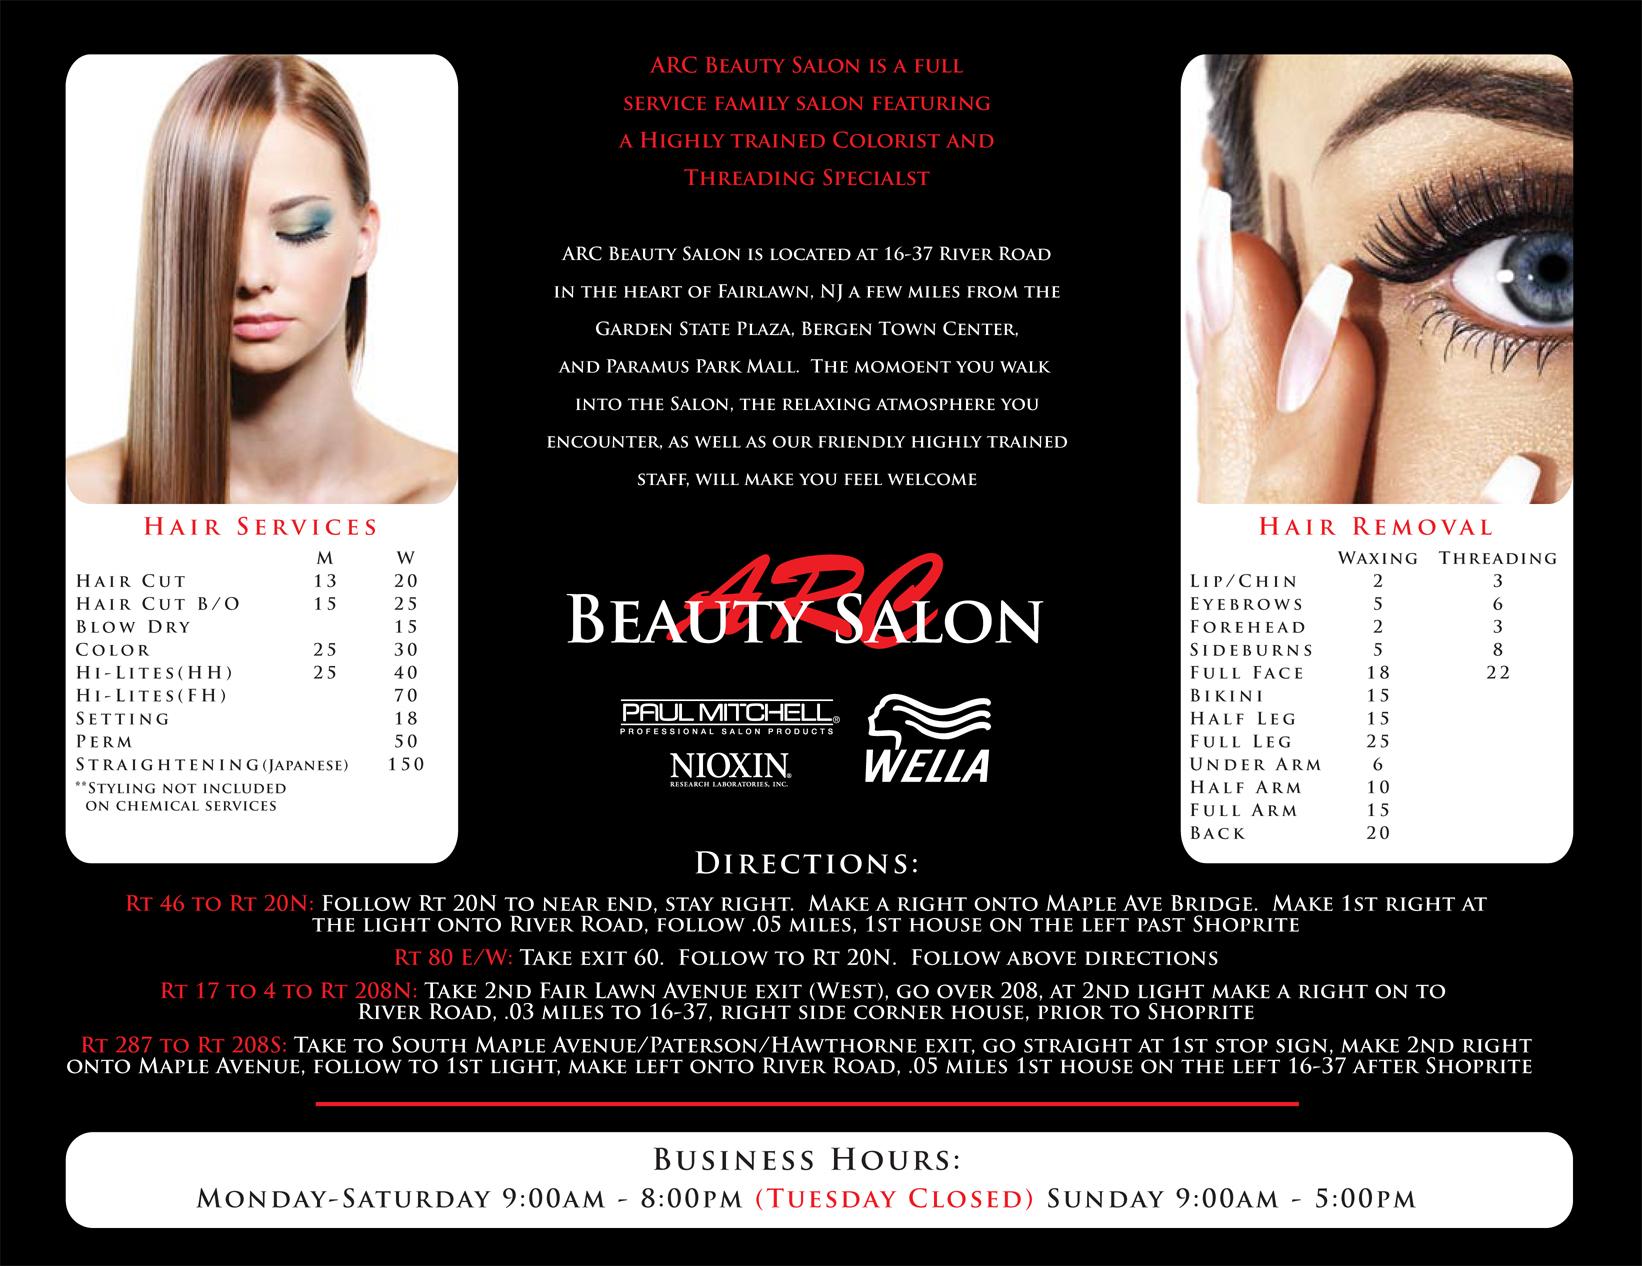 ARC Beauty Salon Brochure Inside by Gabriel Garcia at Coroflot – Salon Brochure